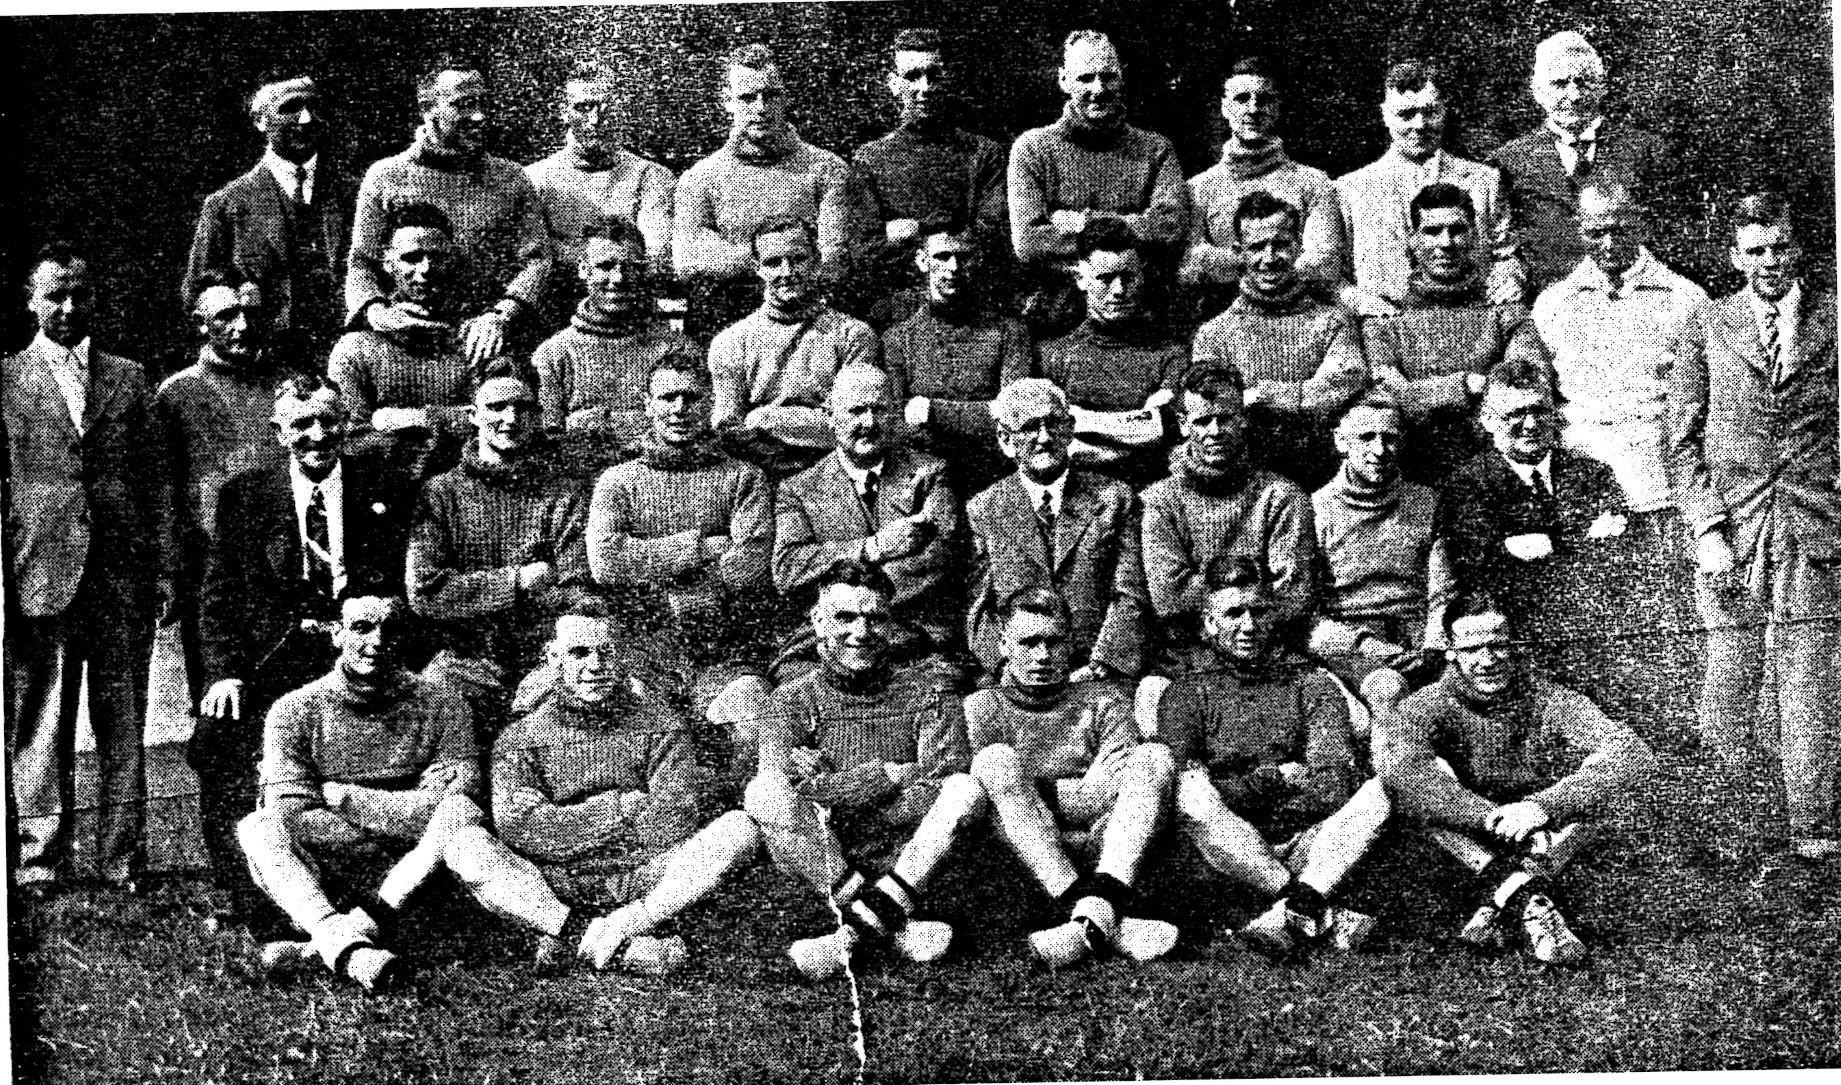 1938/39 Team Photo